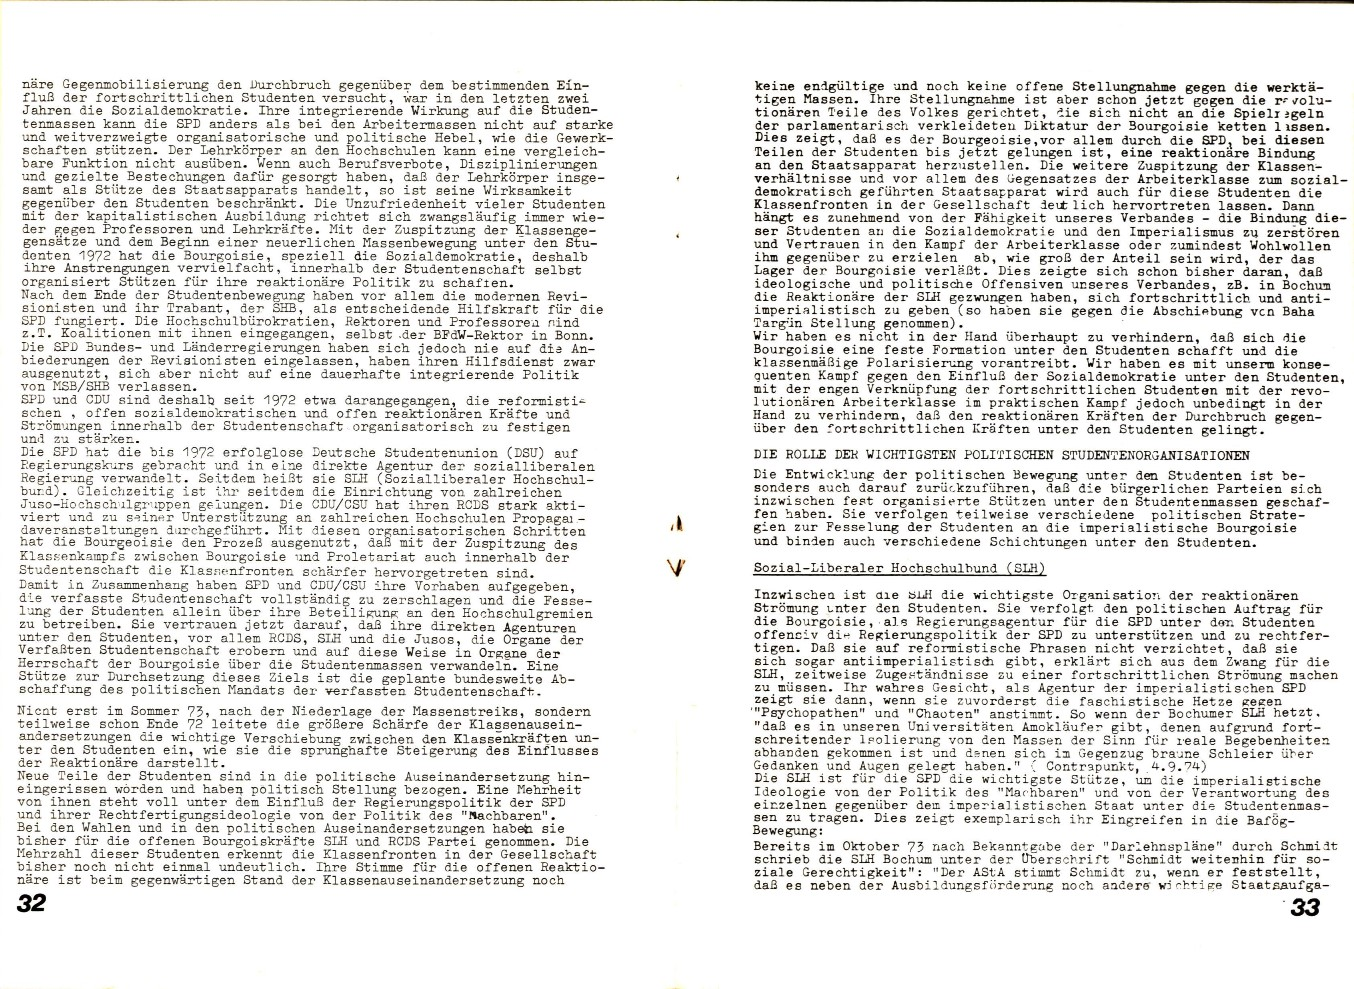 KSV_1974_Rechenschaftsbericht_18